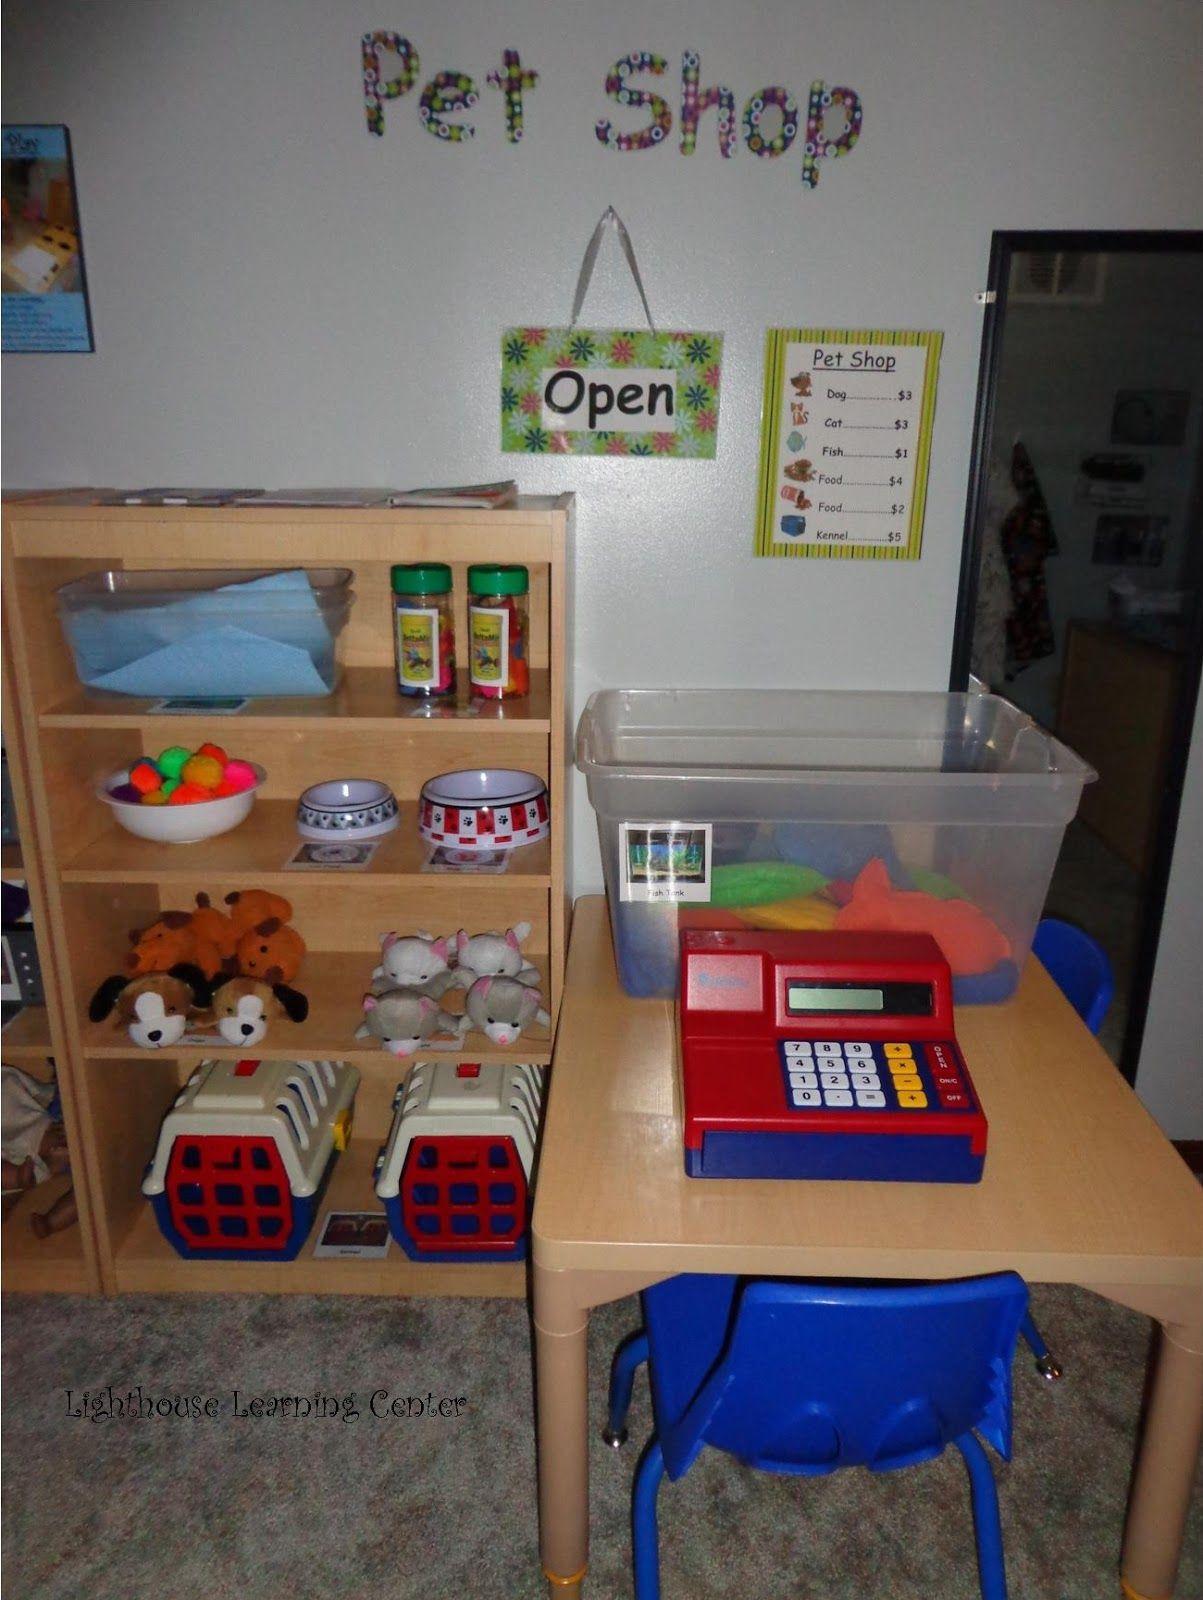 Pet Shop Dramatic Play Lighthouse Learning Center Our Pet Shop Prek Theme